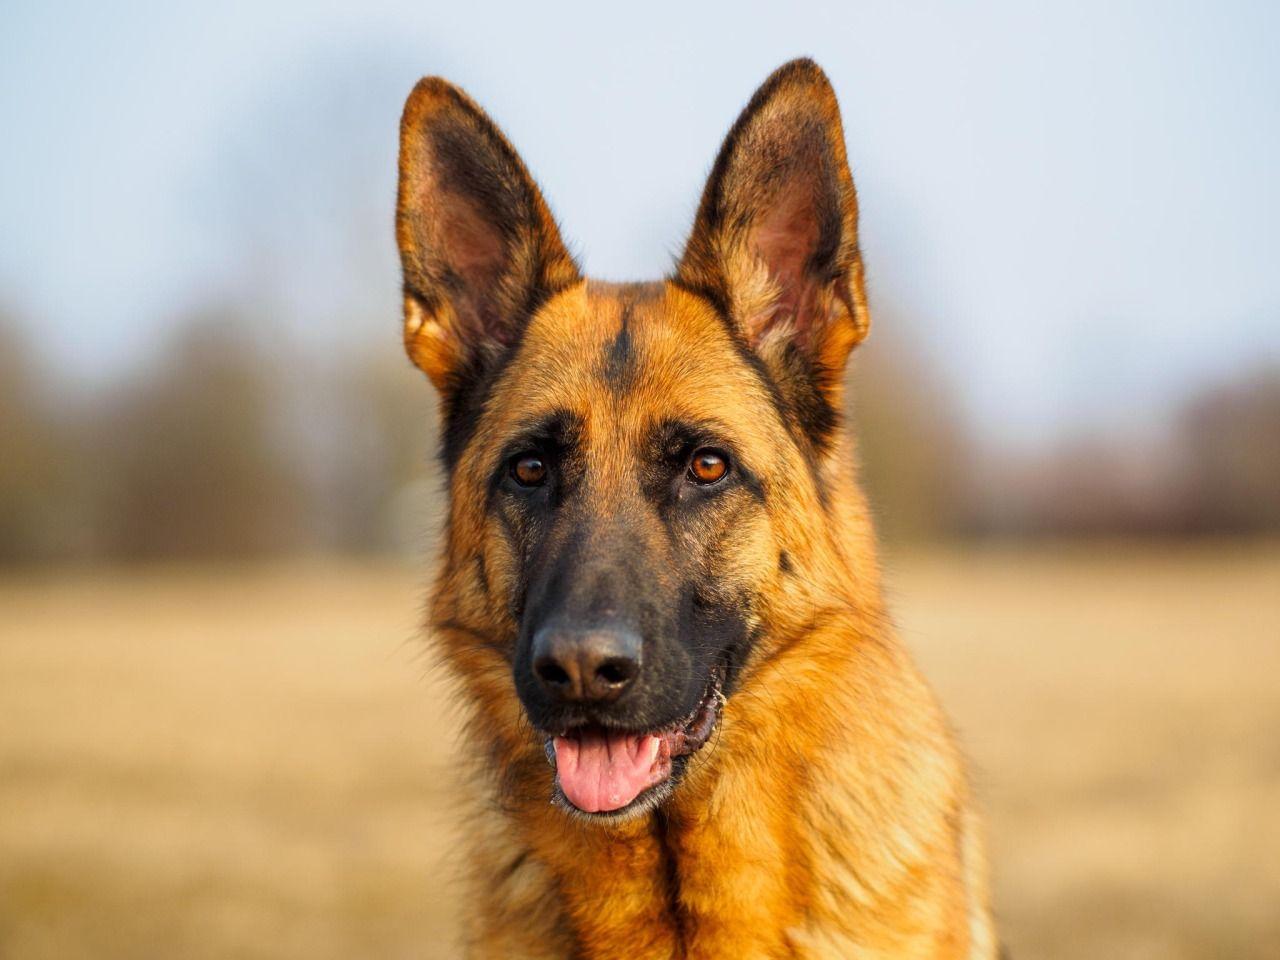 handsomedogs - laughing dog / / Alexander Kunze